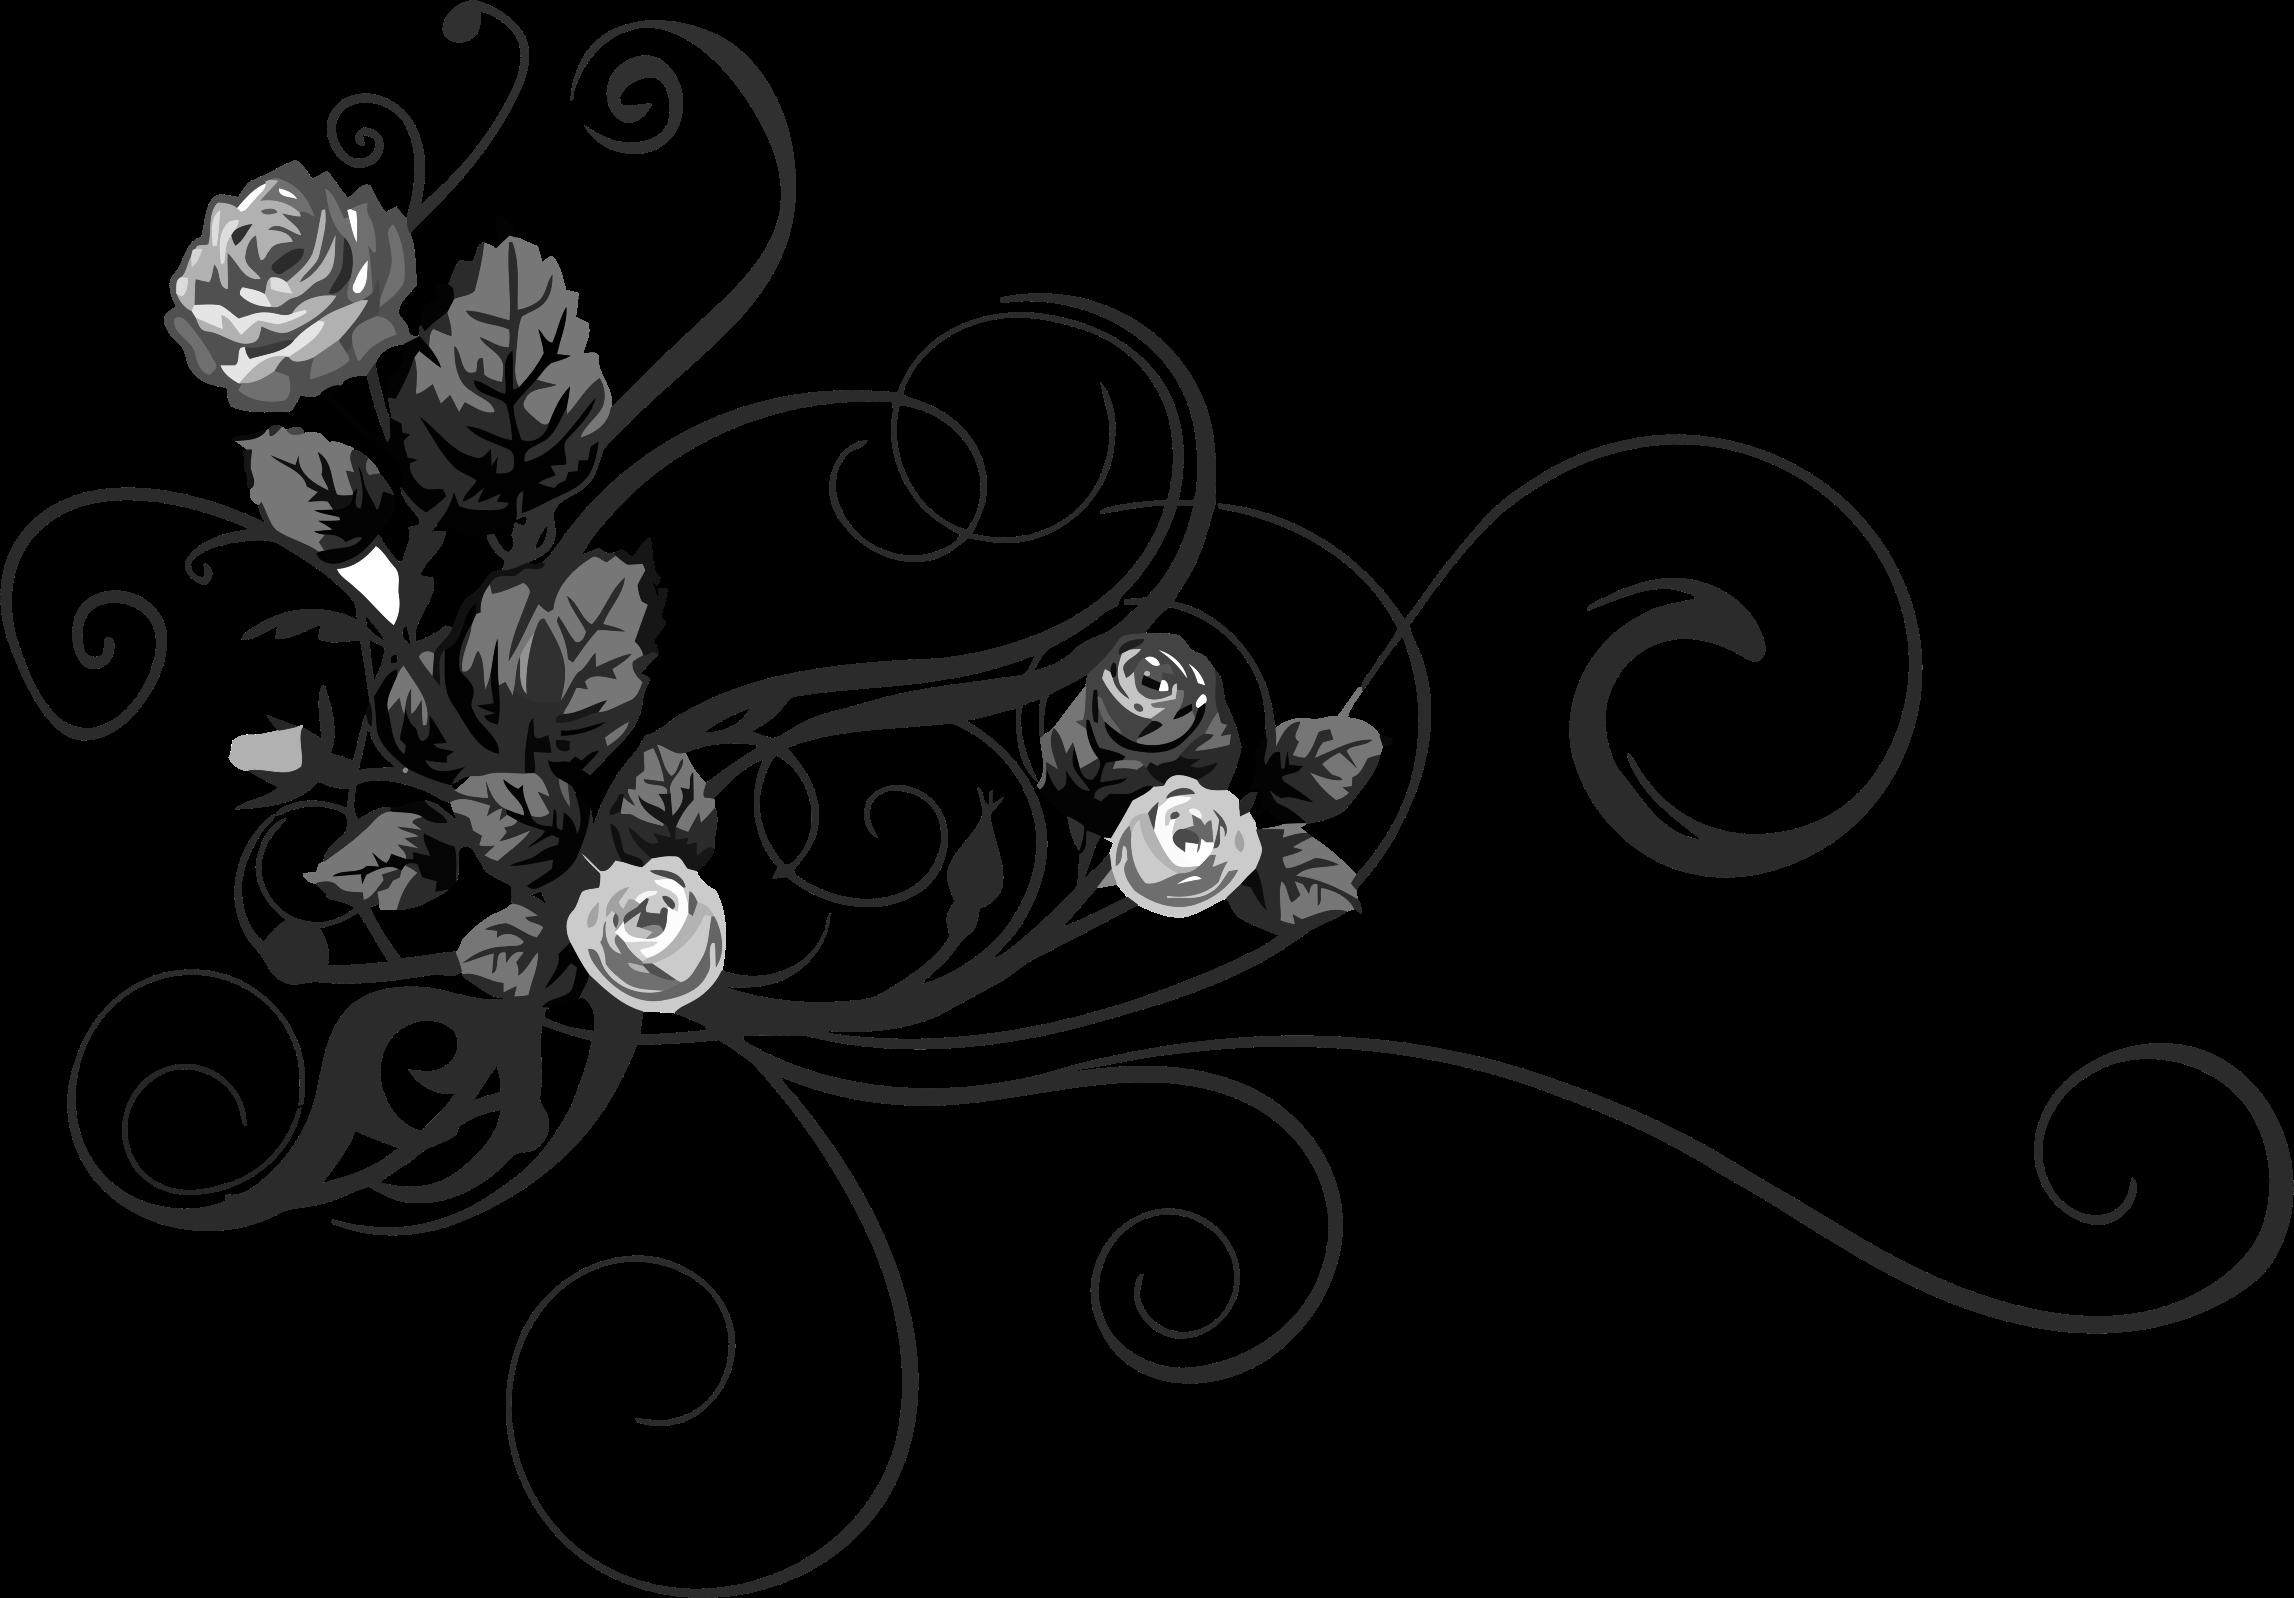 Flourish clipart drawing. Rose floral big image